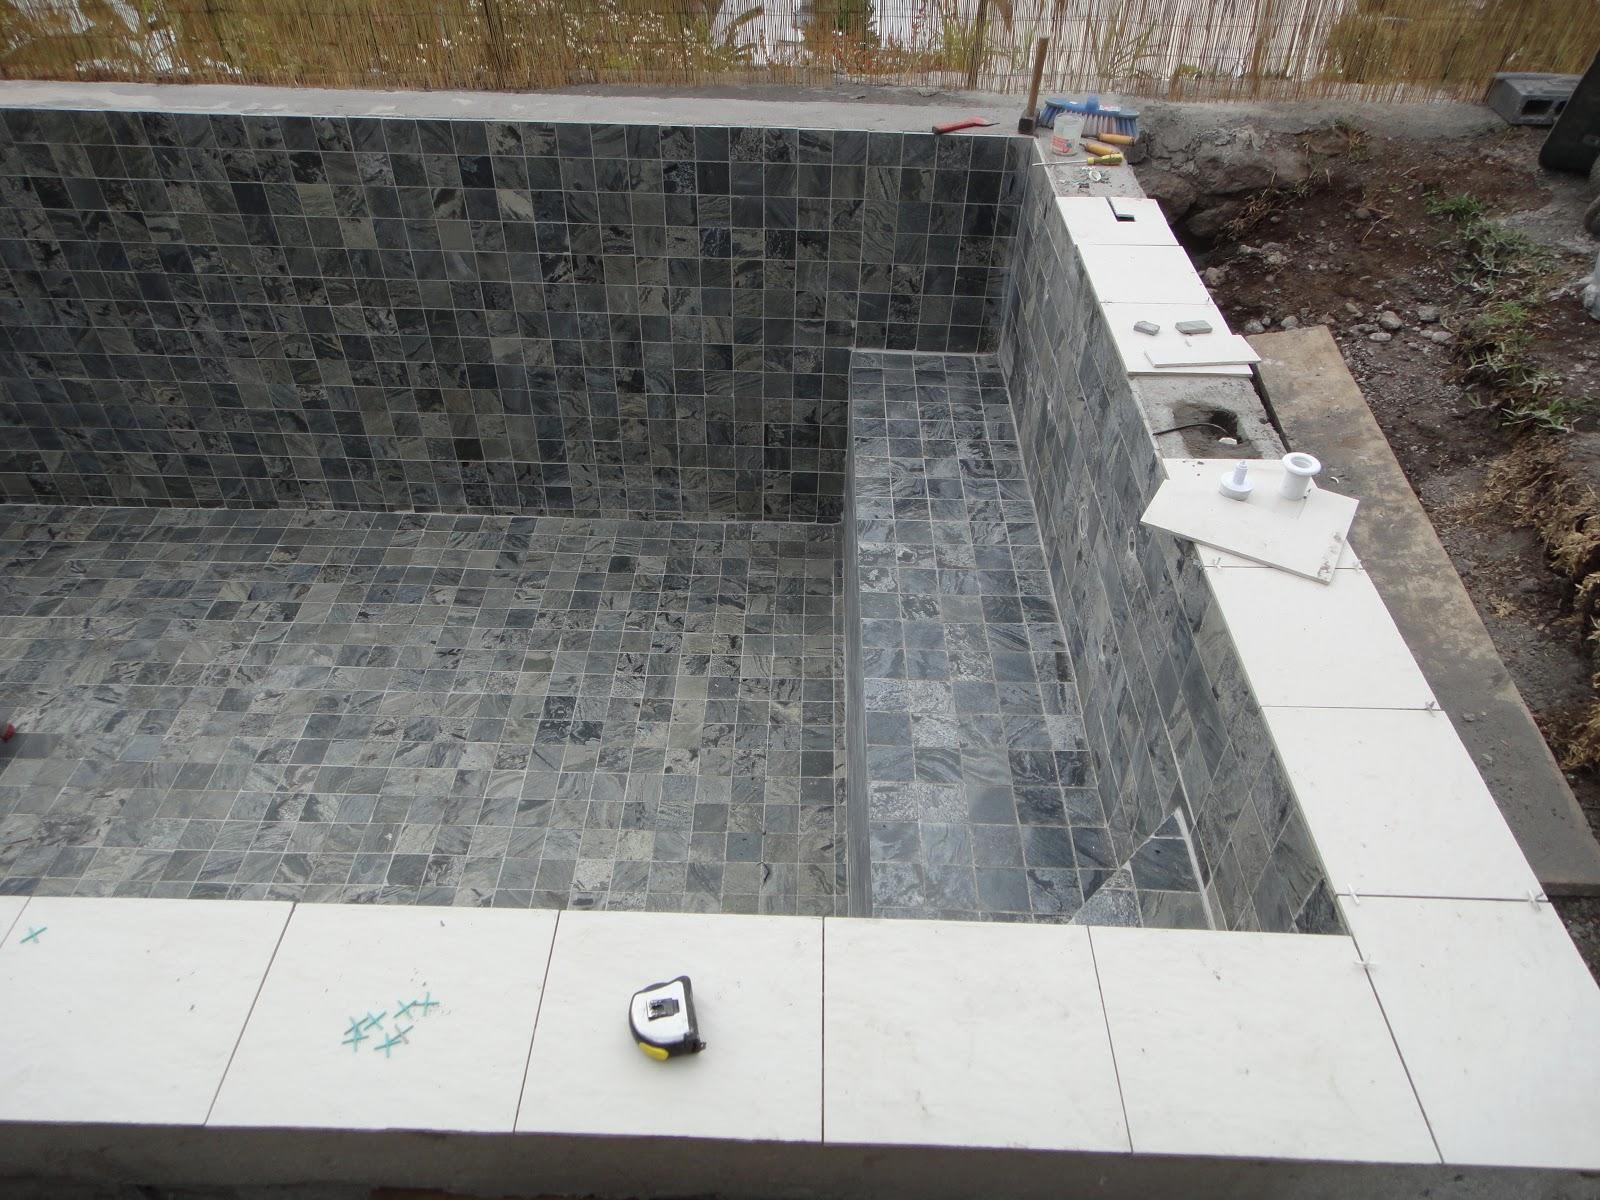 Construire sa piscine partie 3 pose for Construire sa piscine